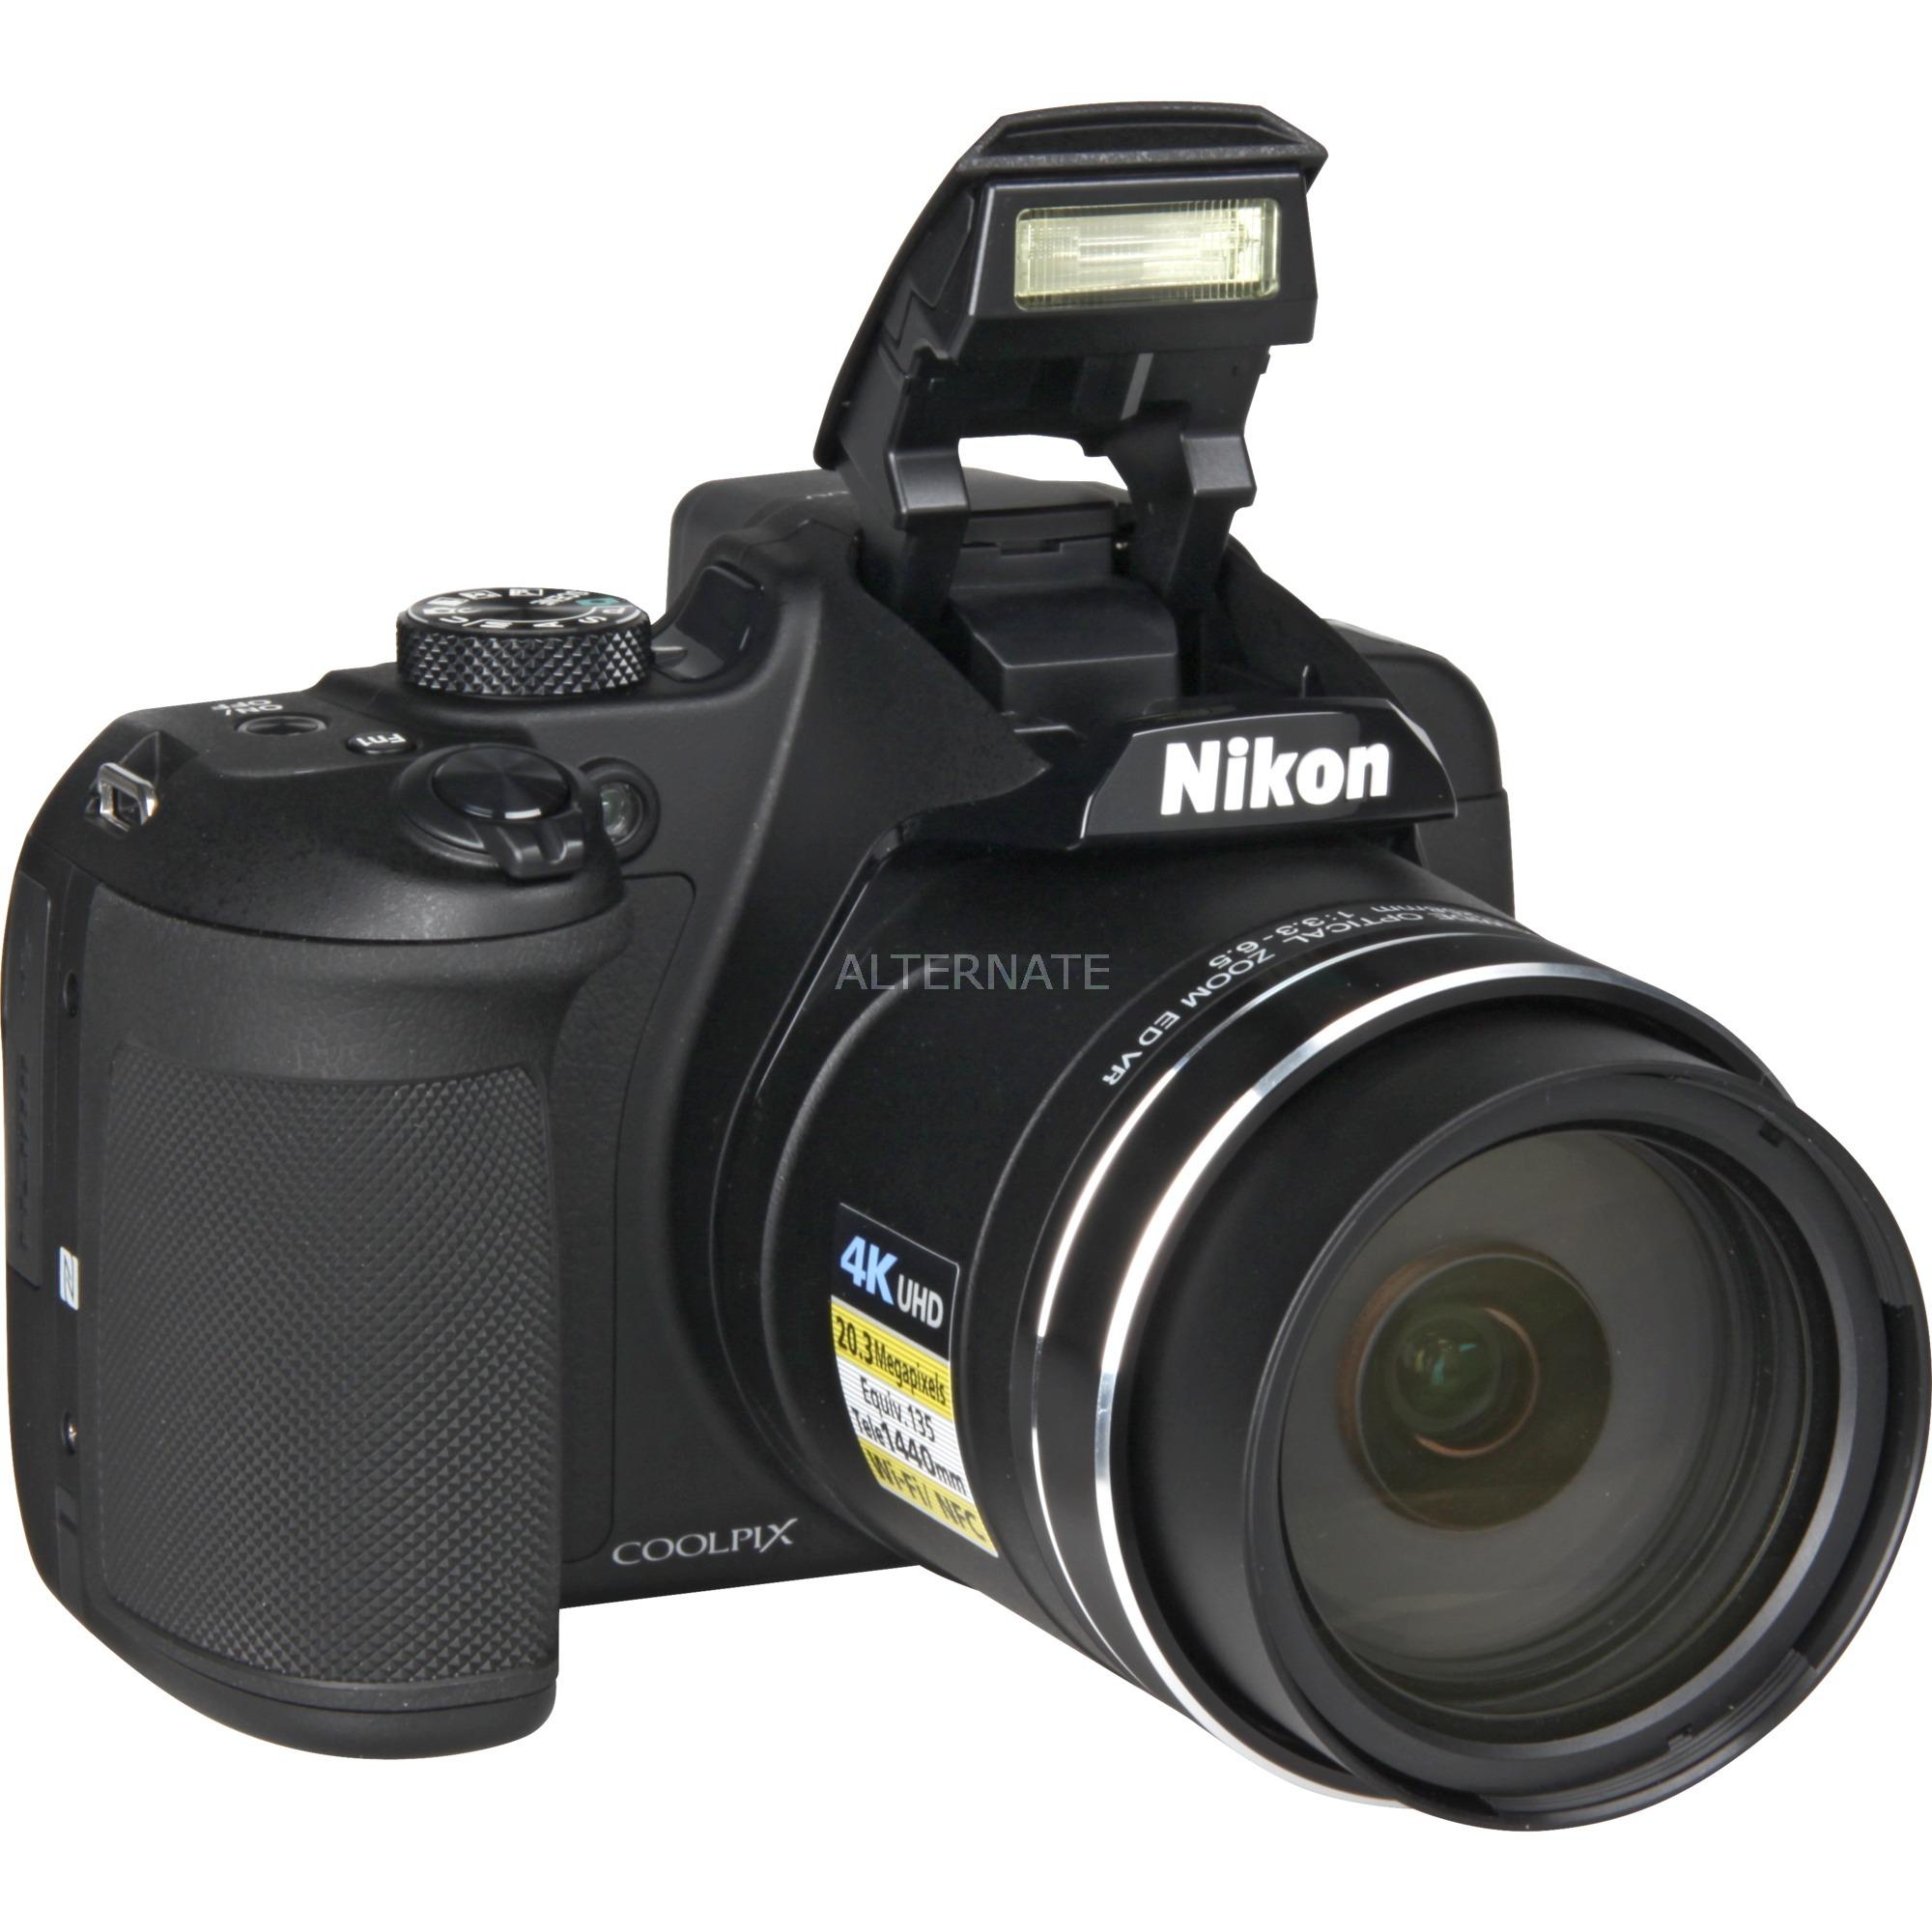 Nikon prezzi e modelli nikon prezzi e modelli prezzi nuovo for Acquari prezzi e modelli